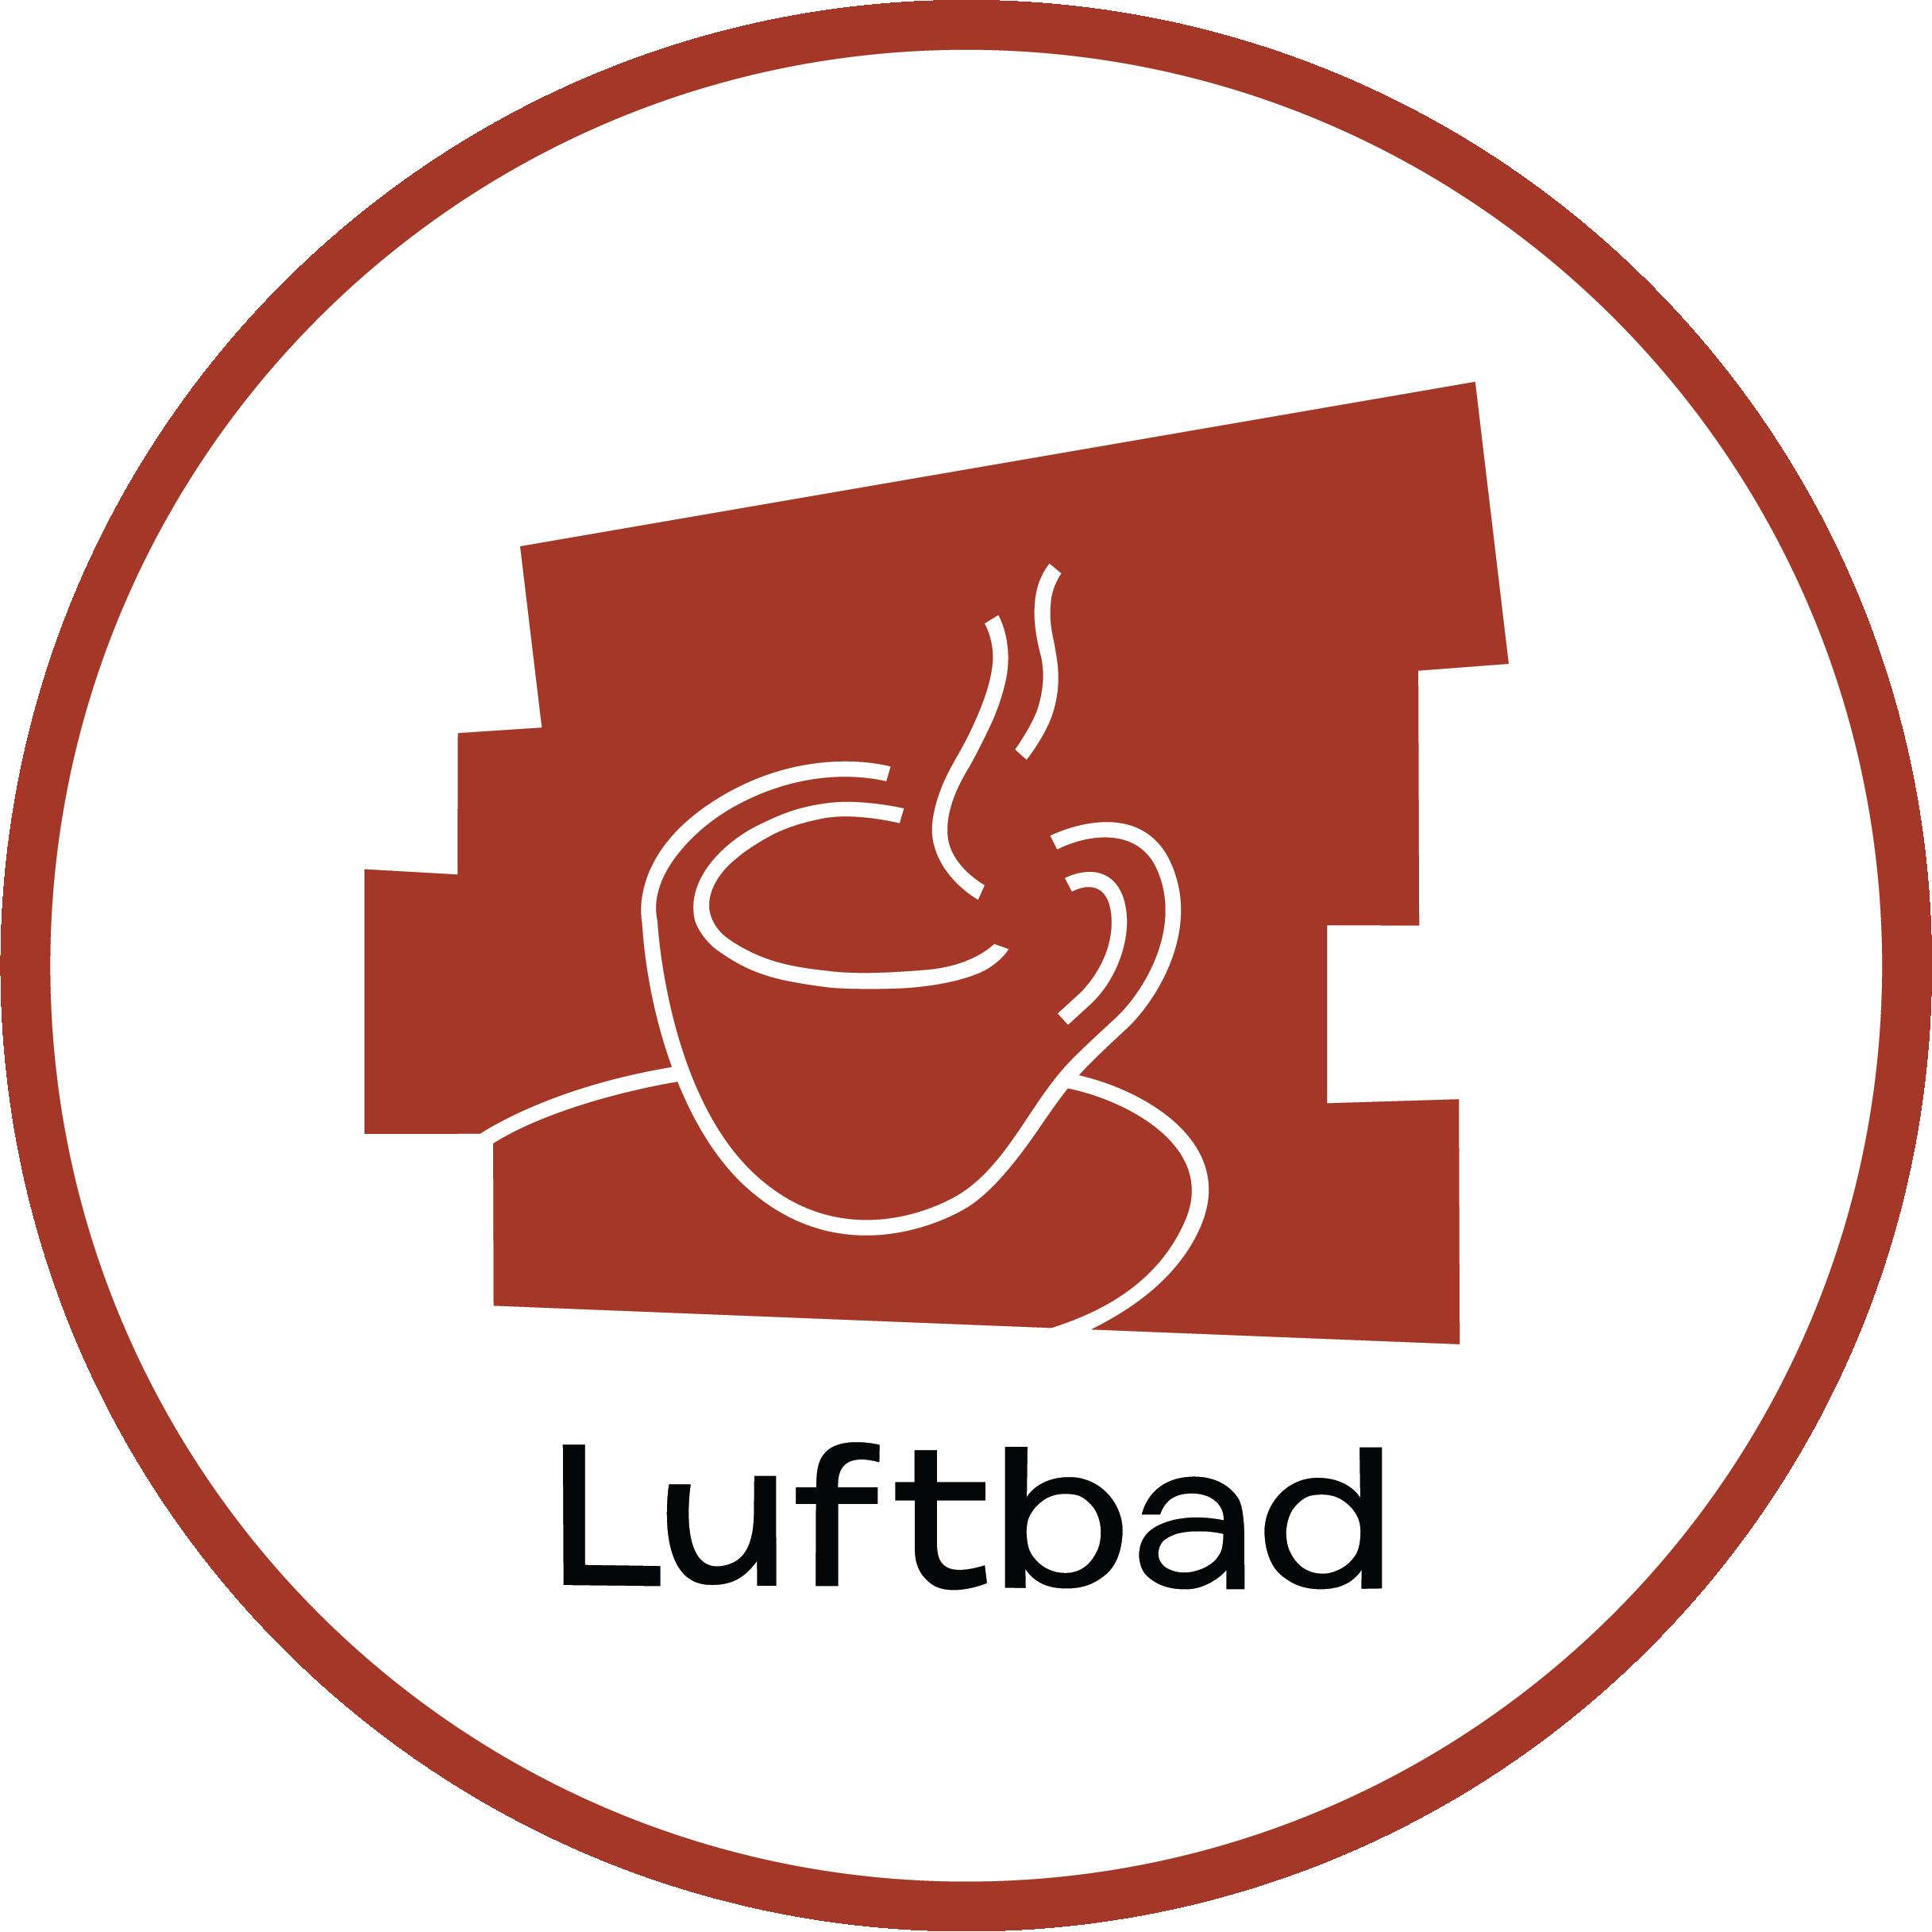 Luftbad Mühlhausen